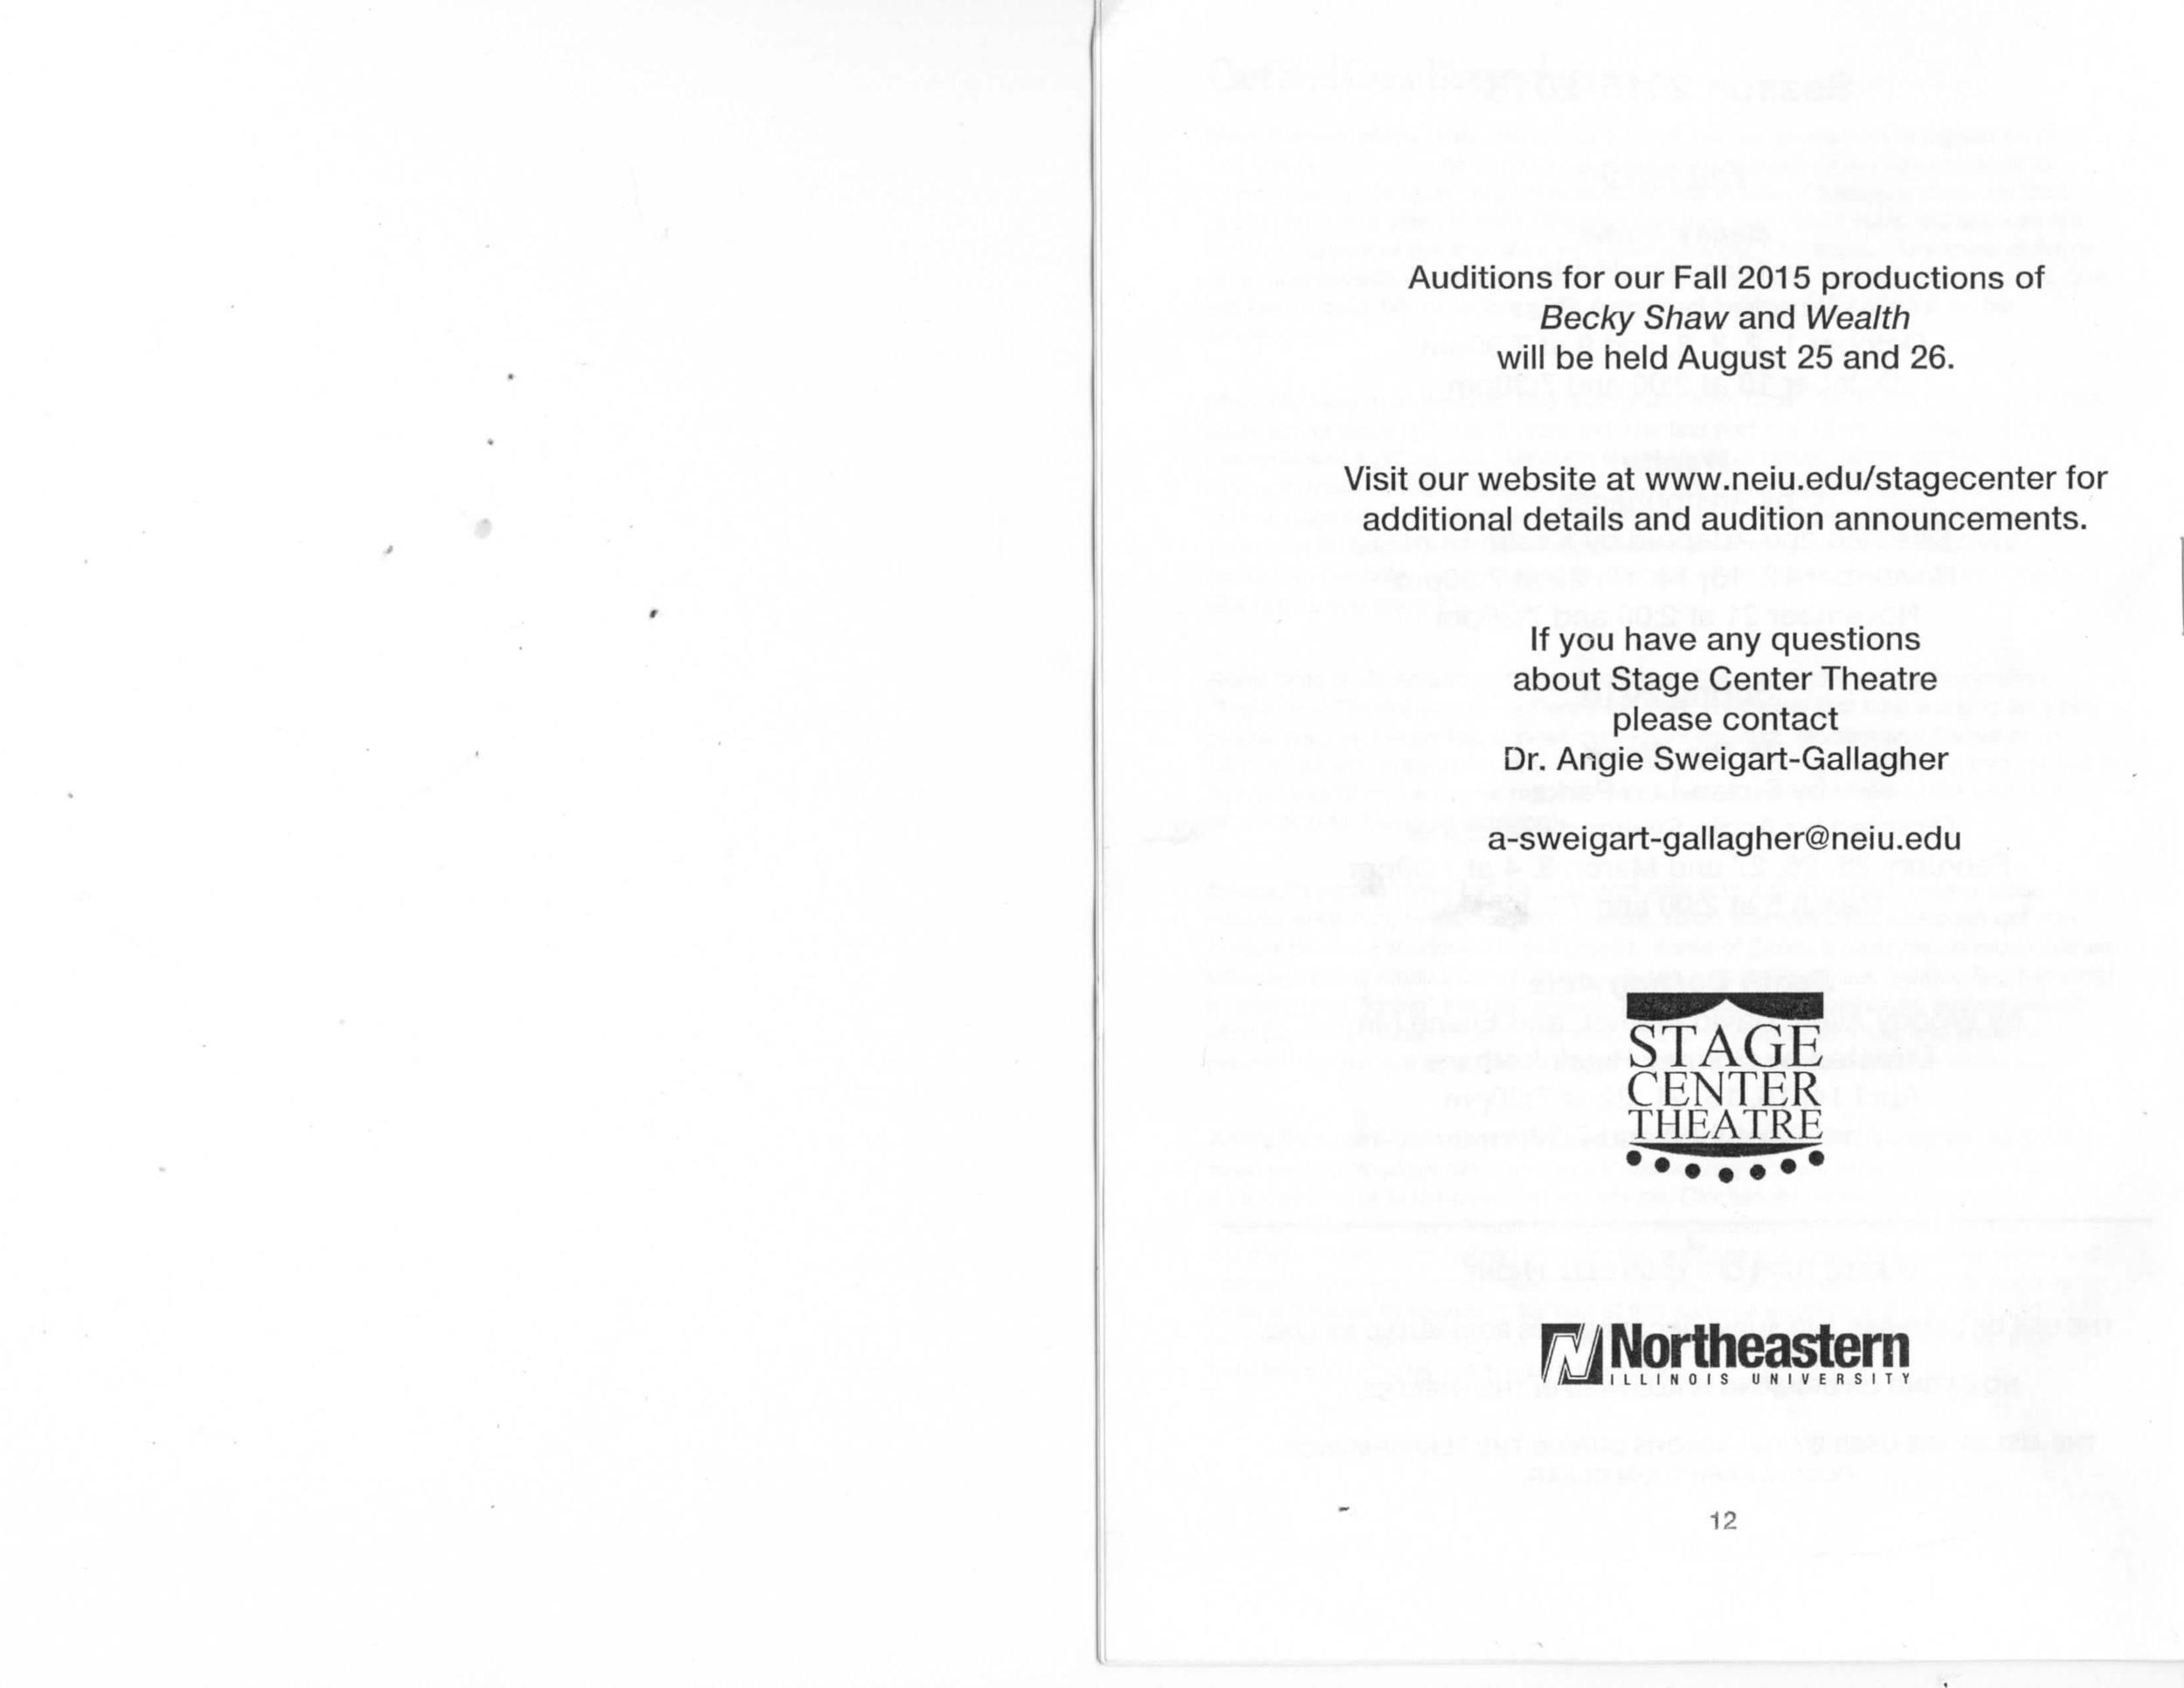 WTW-page-006.jpg